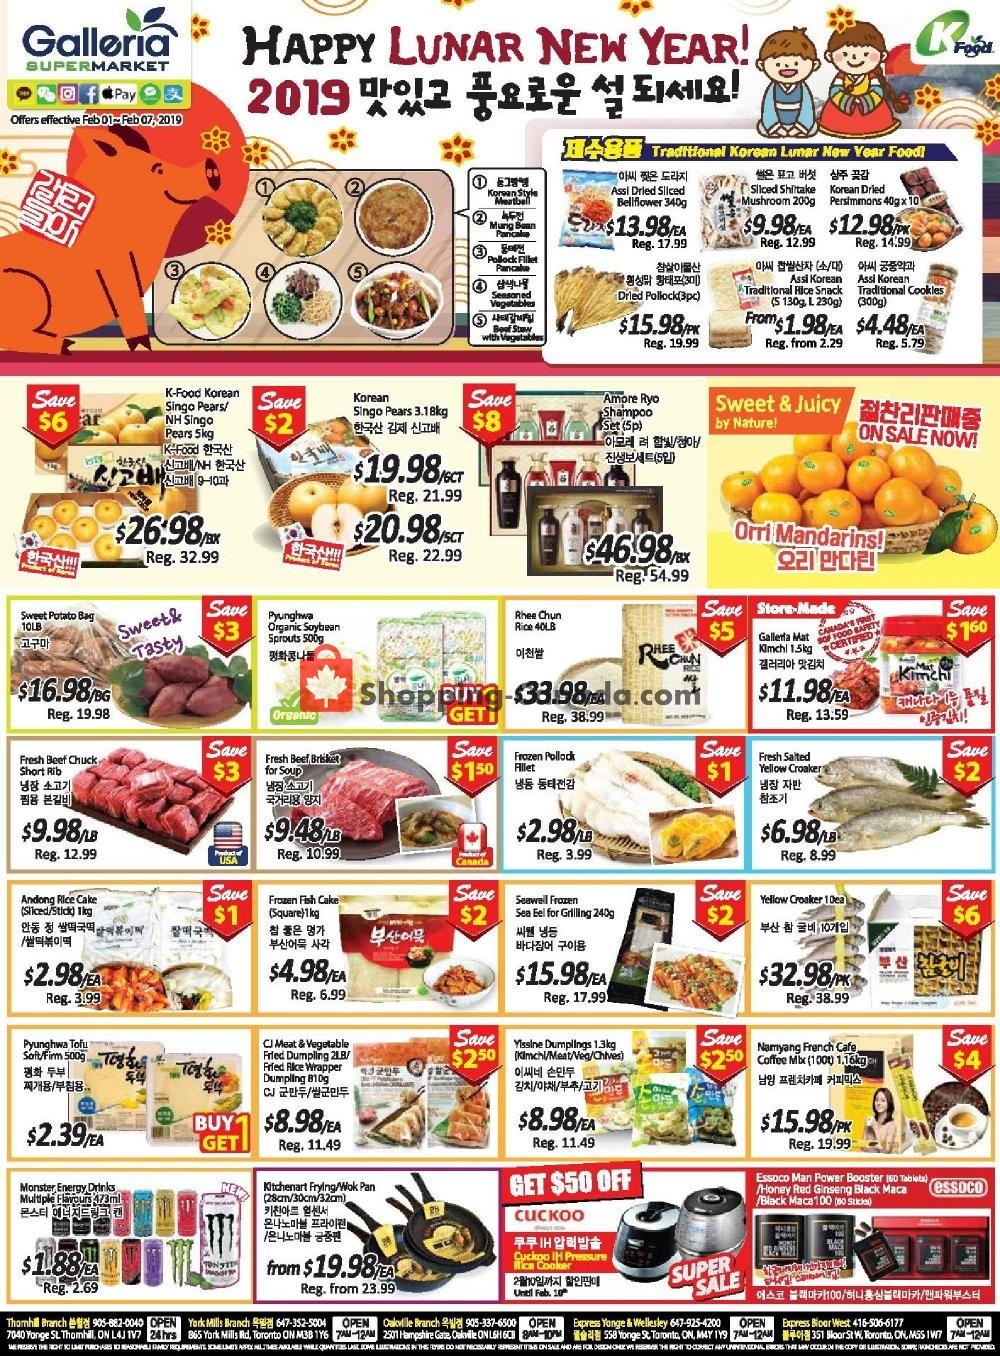 Flyer Galleria Supermarket Canada - from Friday February 1, 2019 to Thursday February 7, 2019